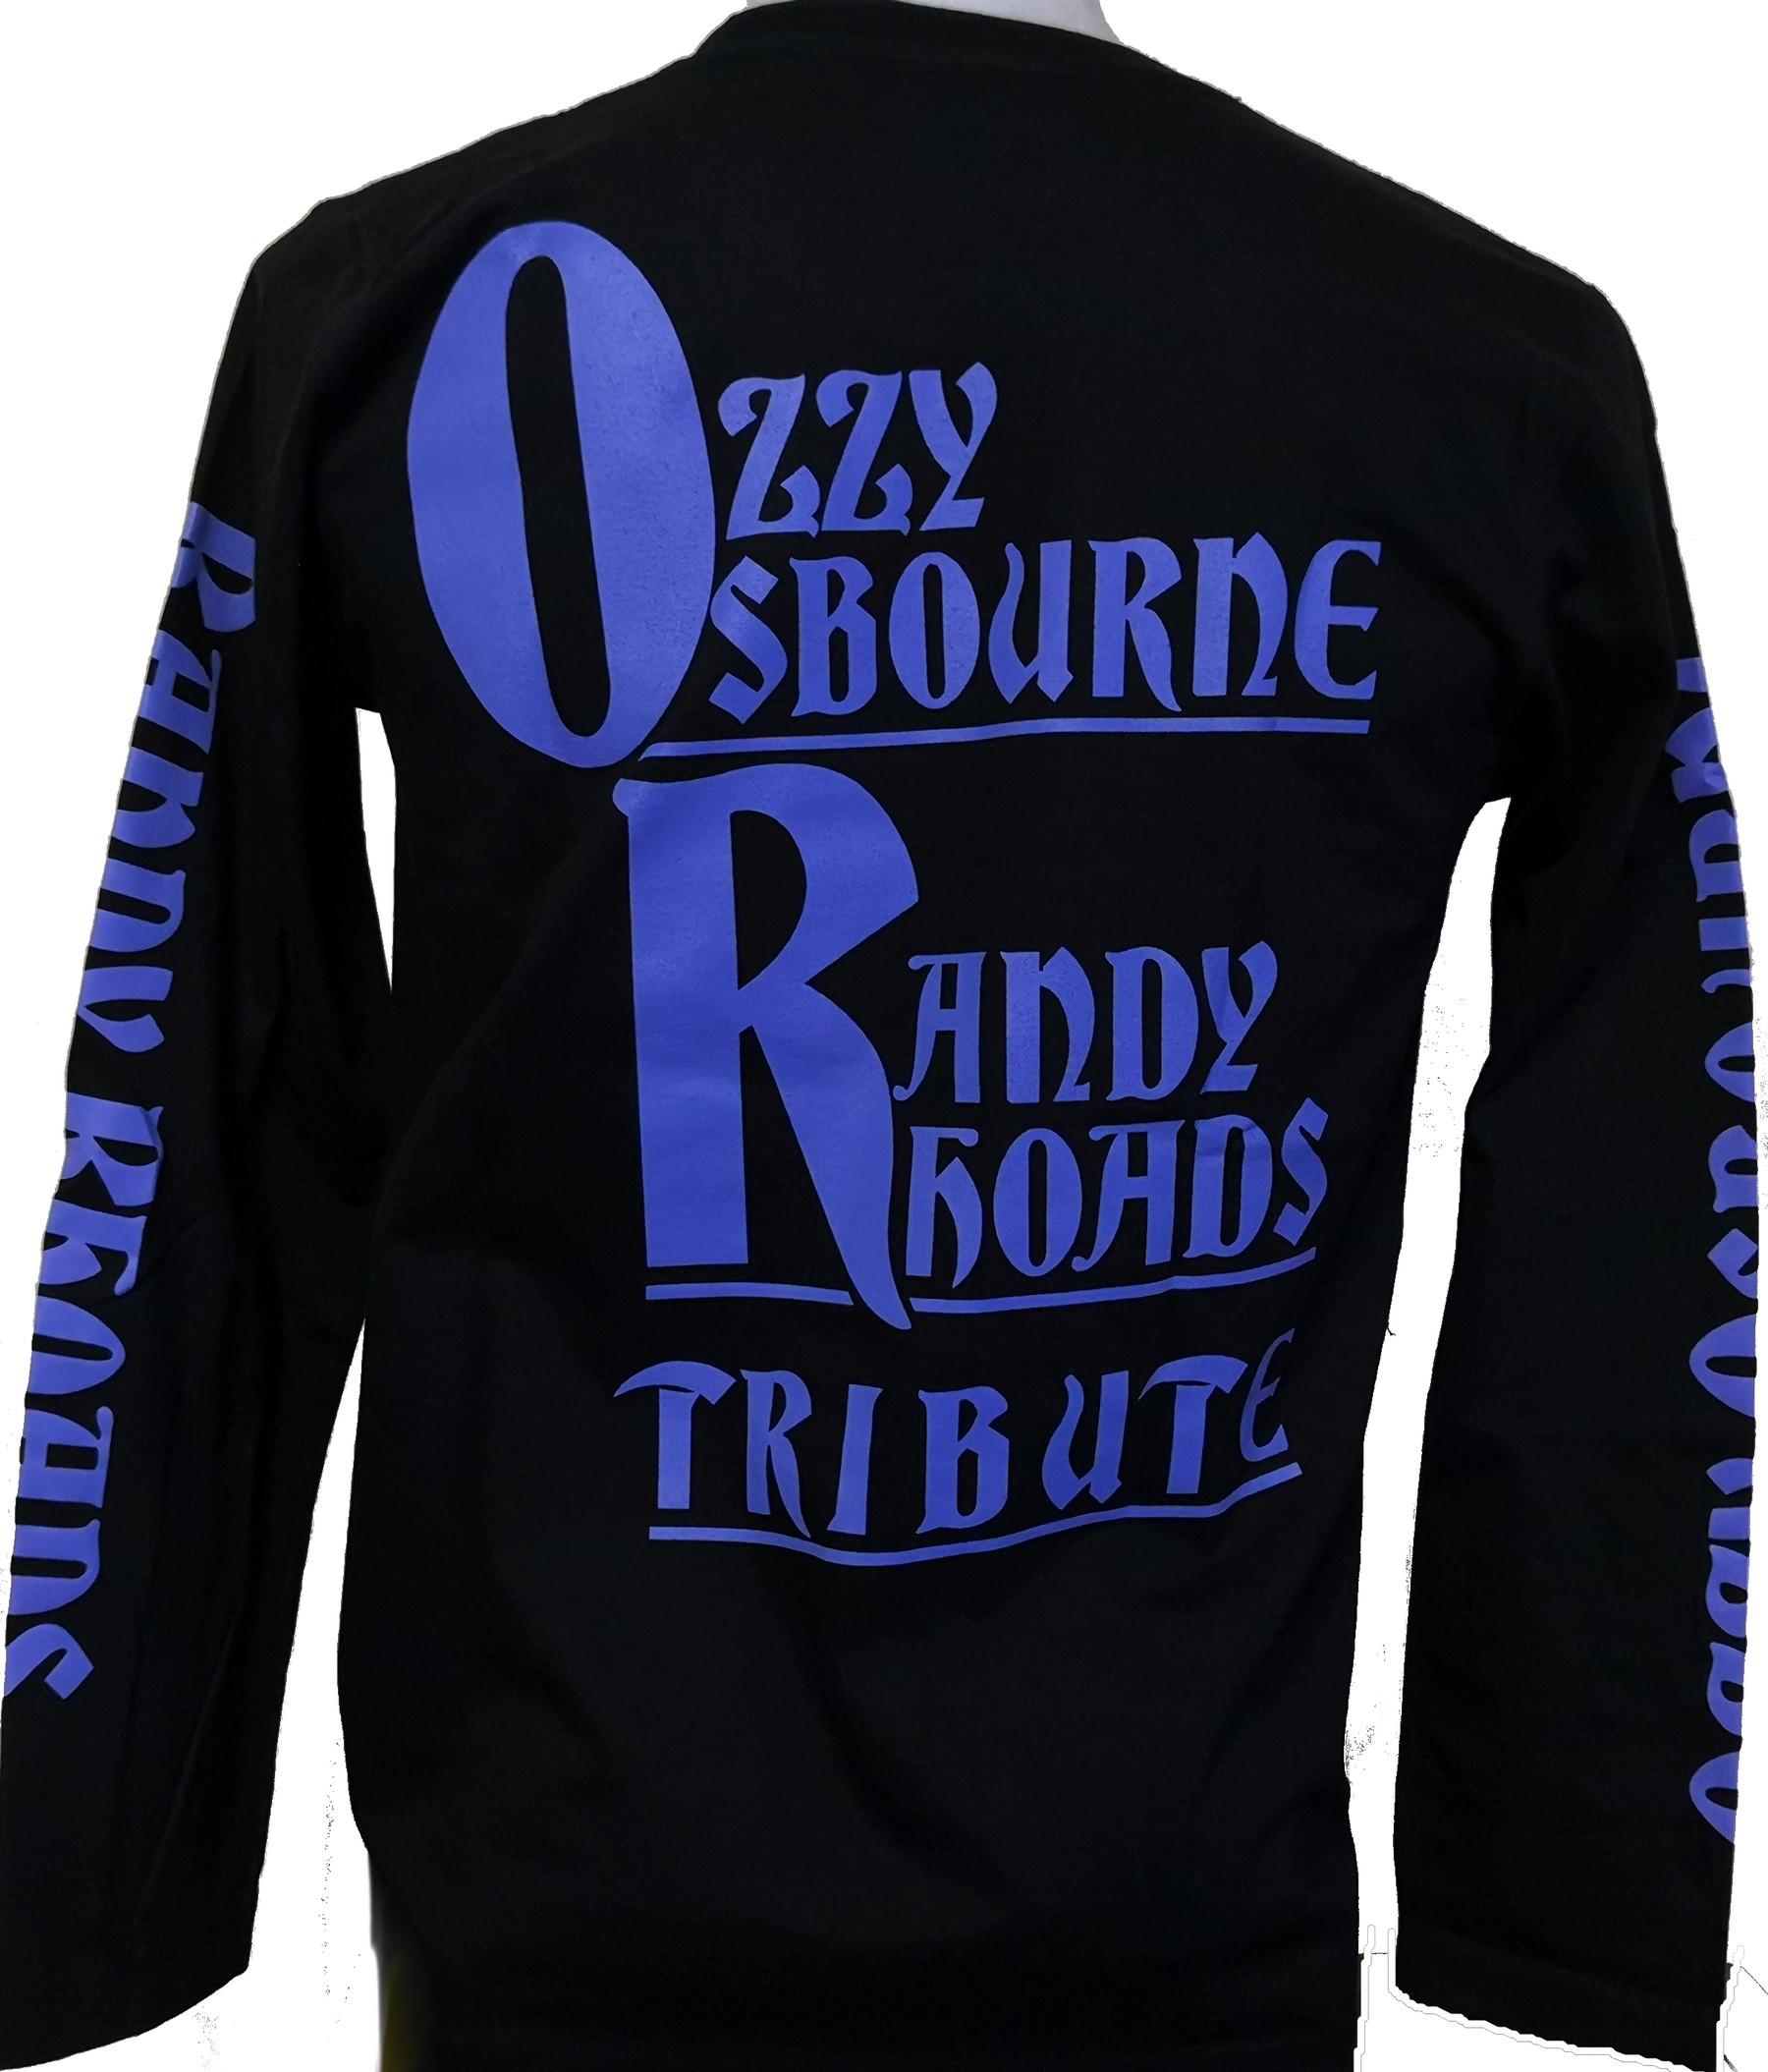 NEW Randy Rhoads 2021 T SHIRT Size S-2XL Details about  /RARE!